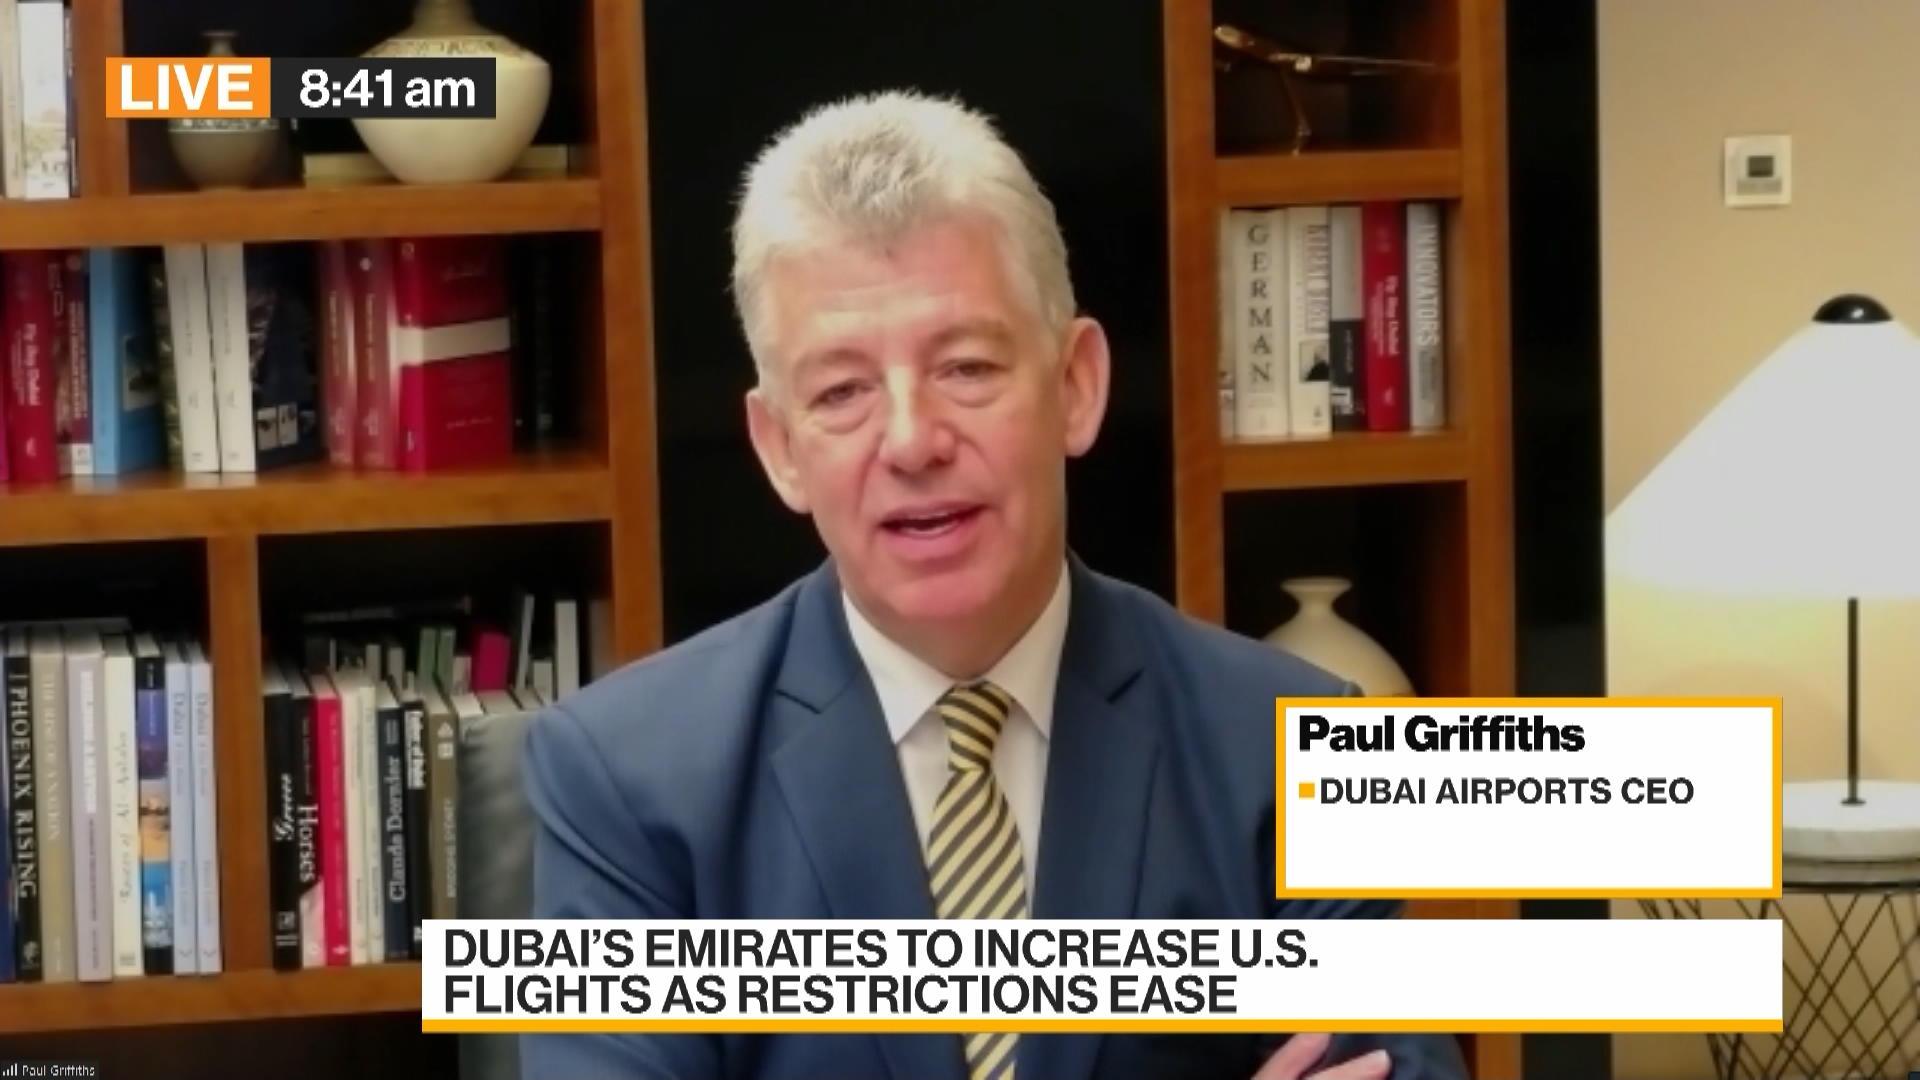 Dubai Airports CEO: 'Massive Impact' From U.K. Travel Easing